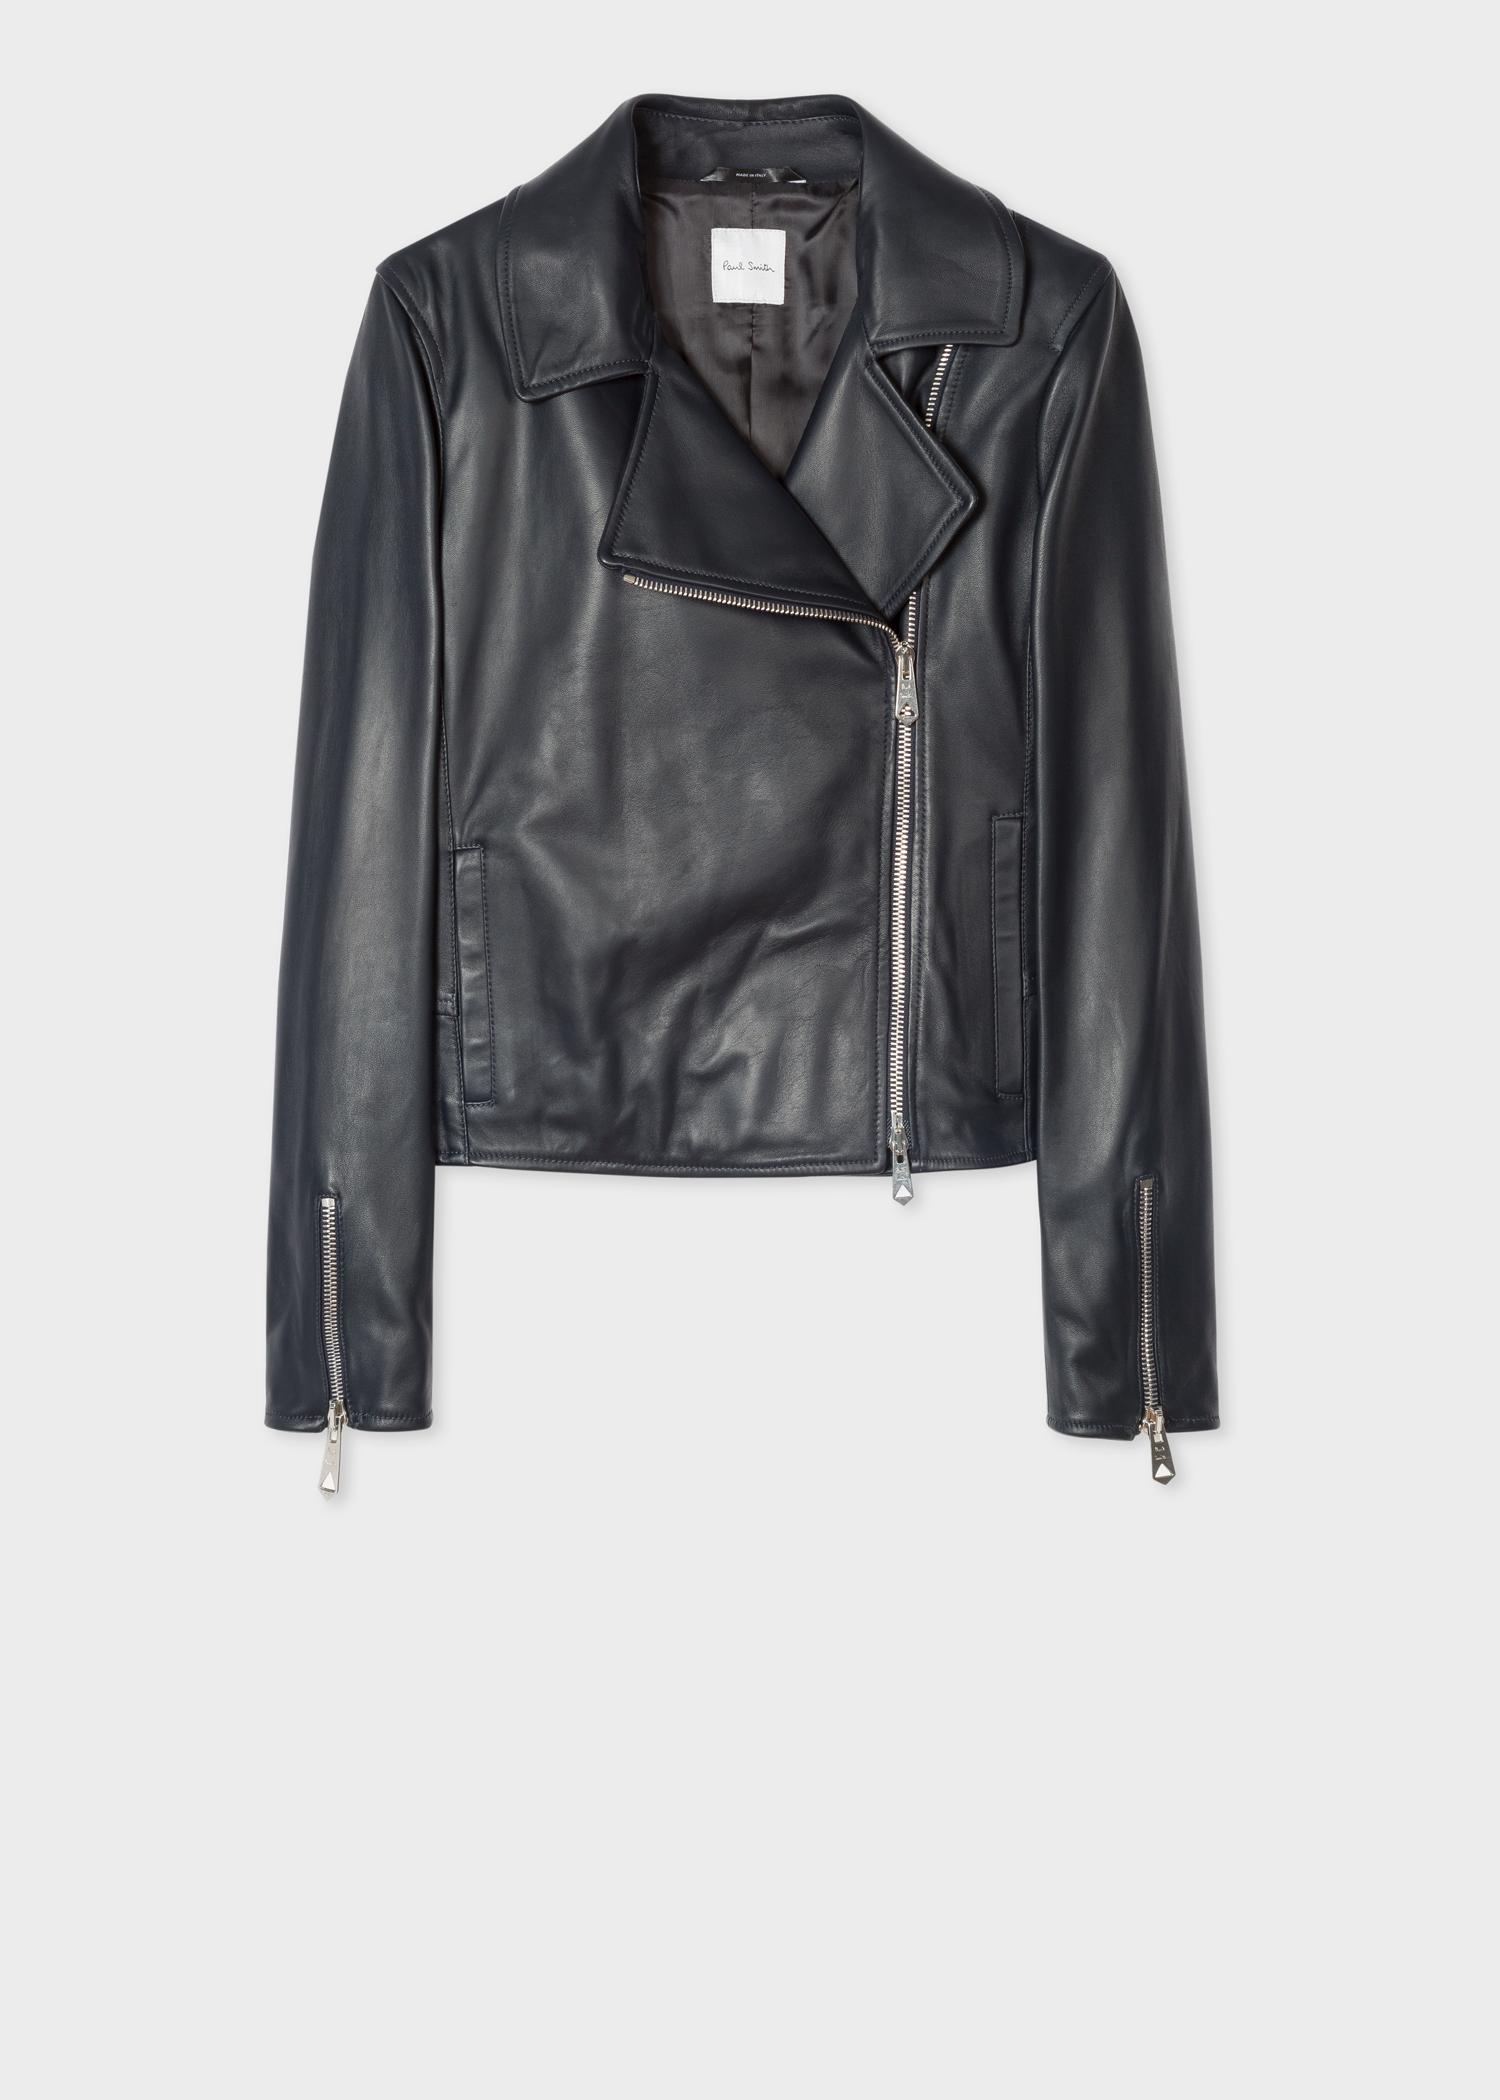 59be053b87e Front View - Women s Dark Navy Two-Way Zip Leather Biker Jacket Paul Smith